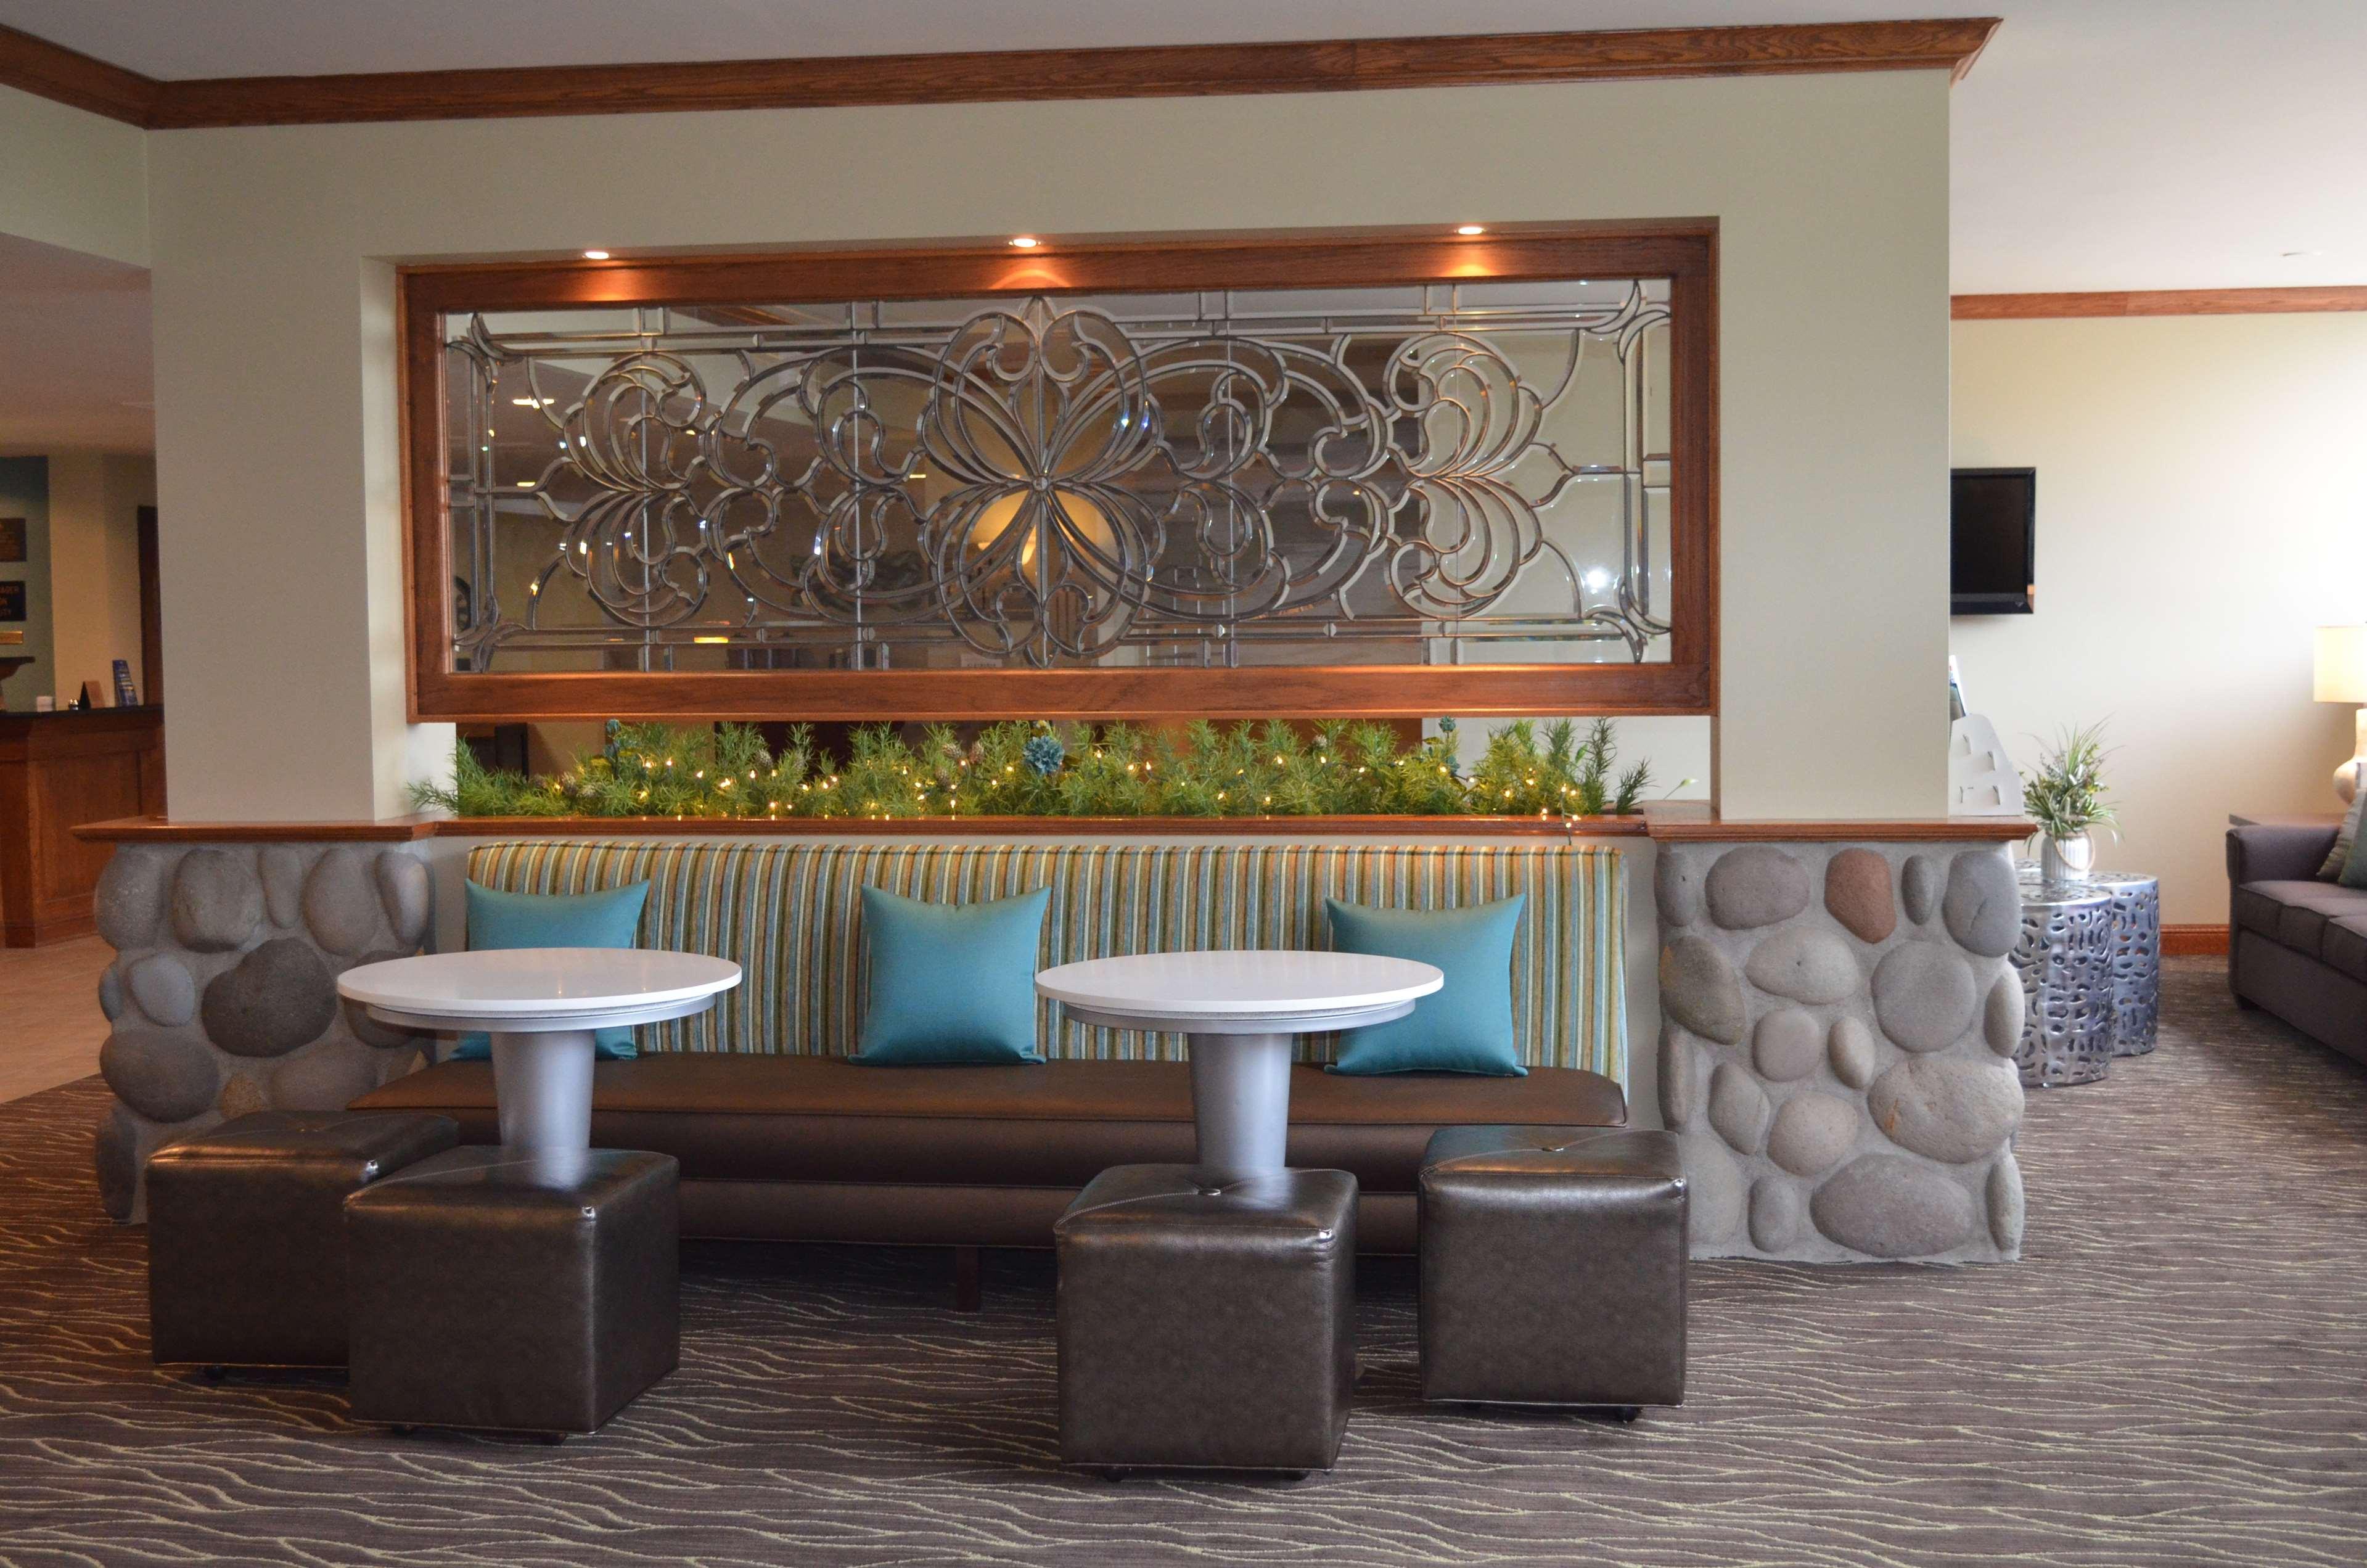 Best Western Agate Beach Inn image 12